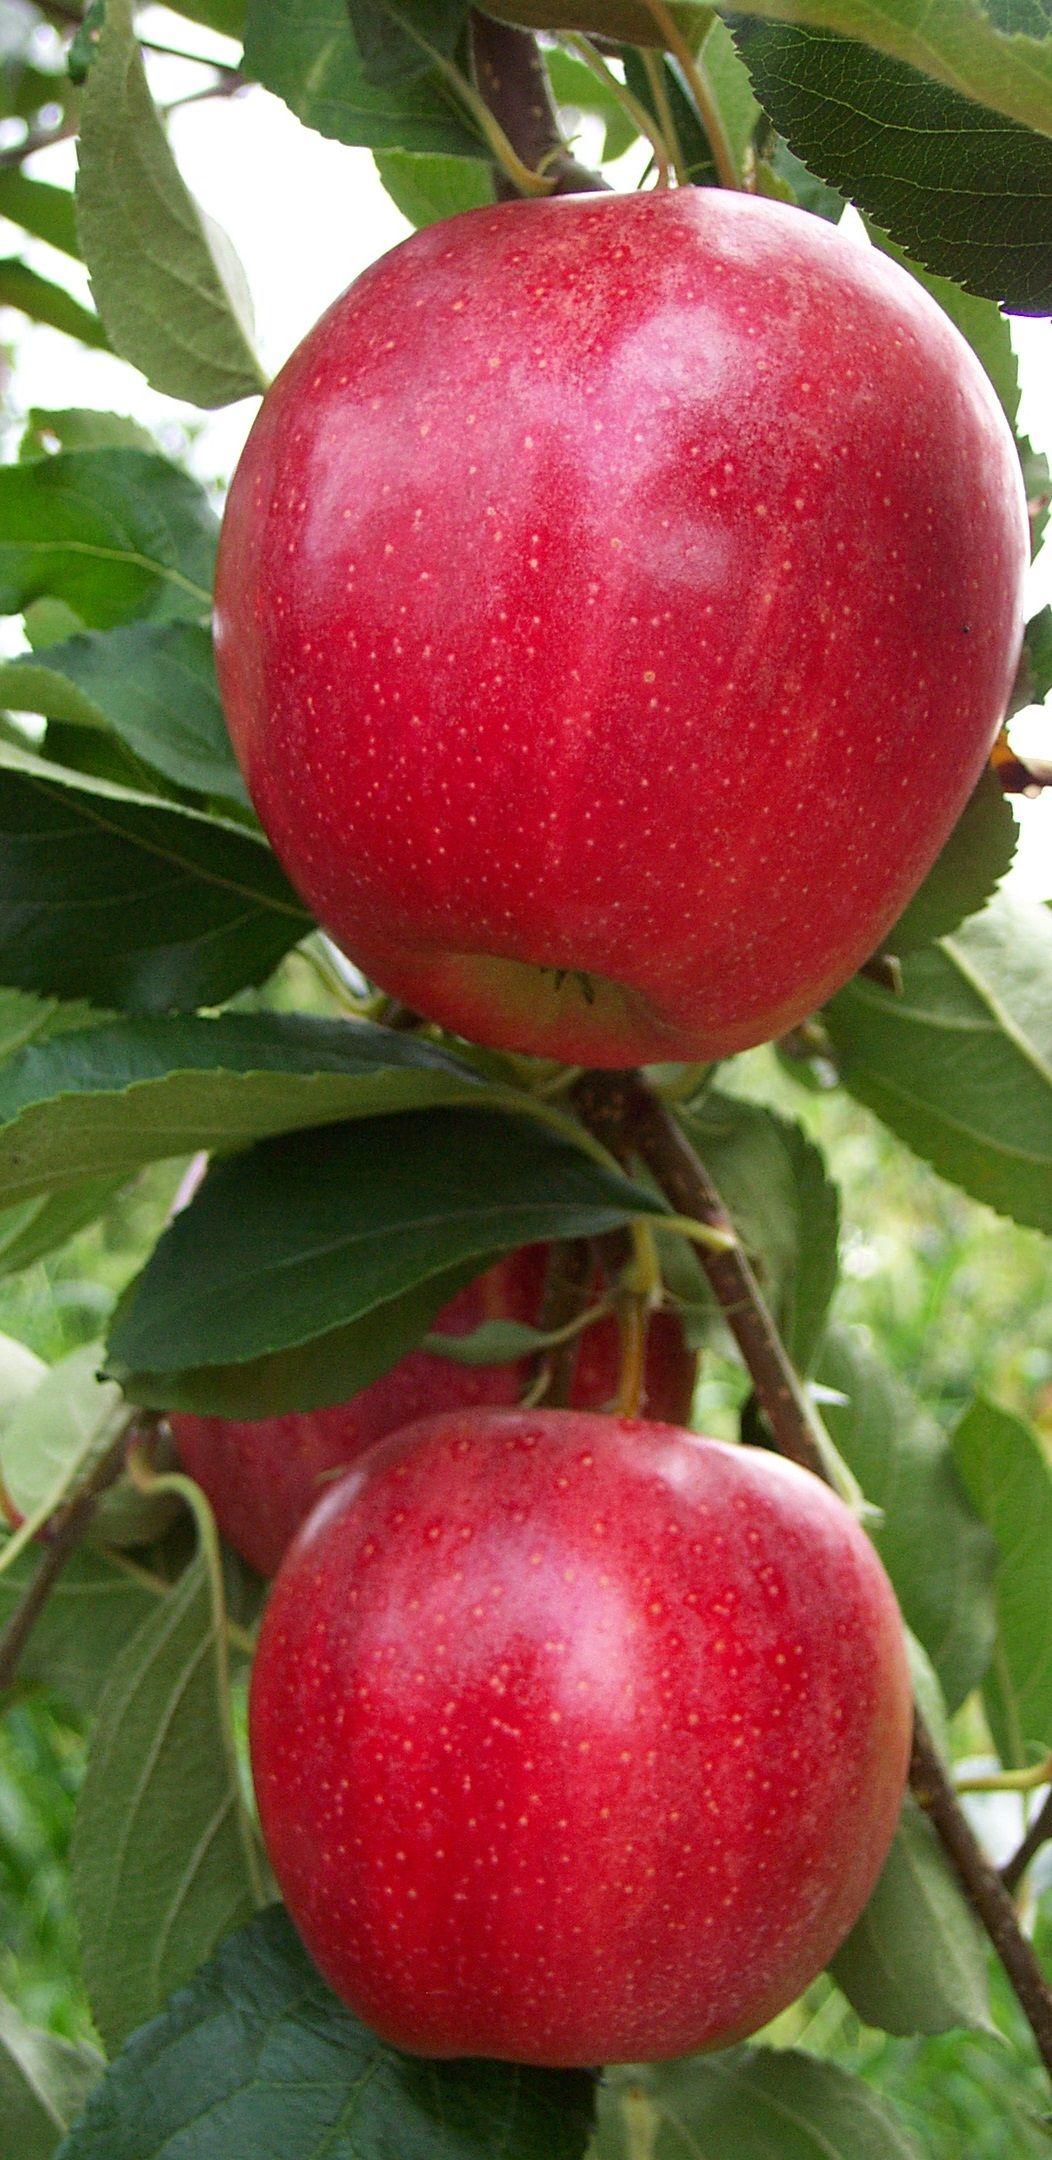 Fresh apple gala must apple buy fresh apples gala apple product